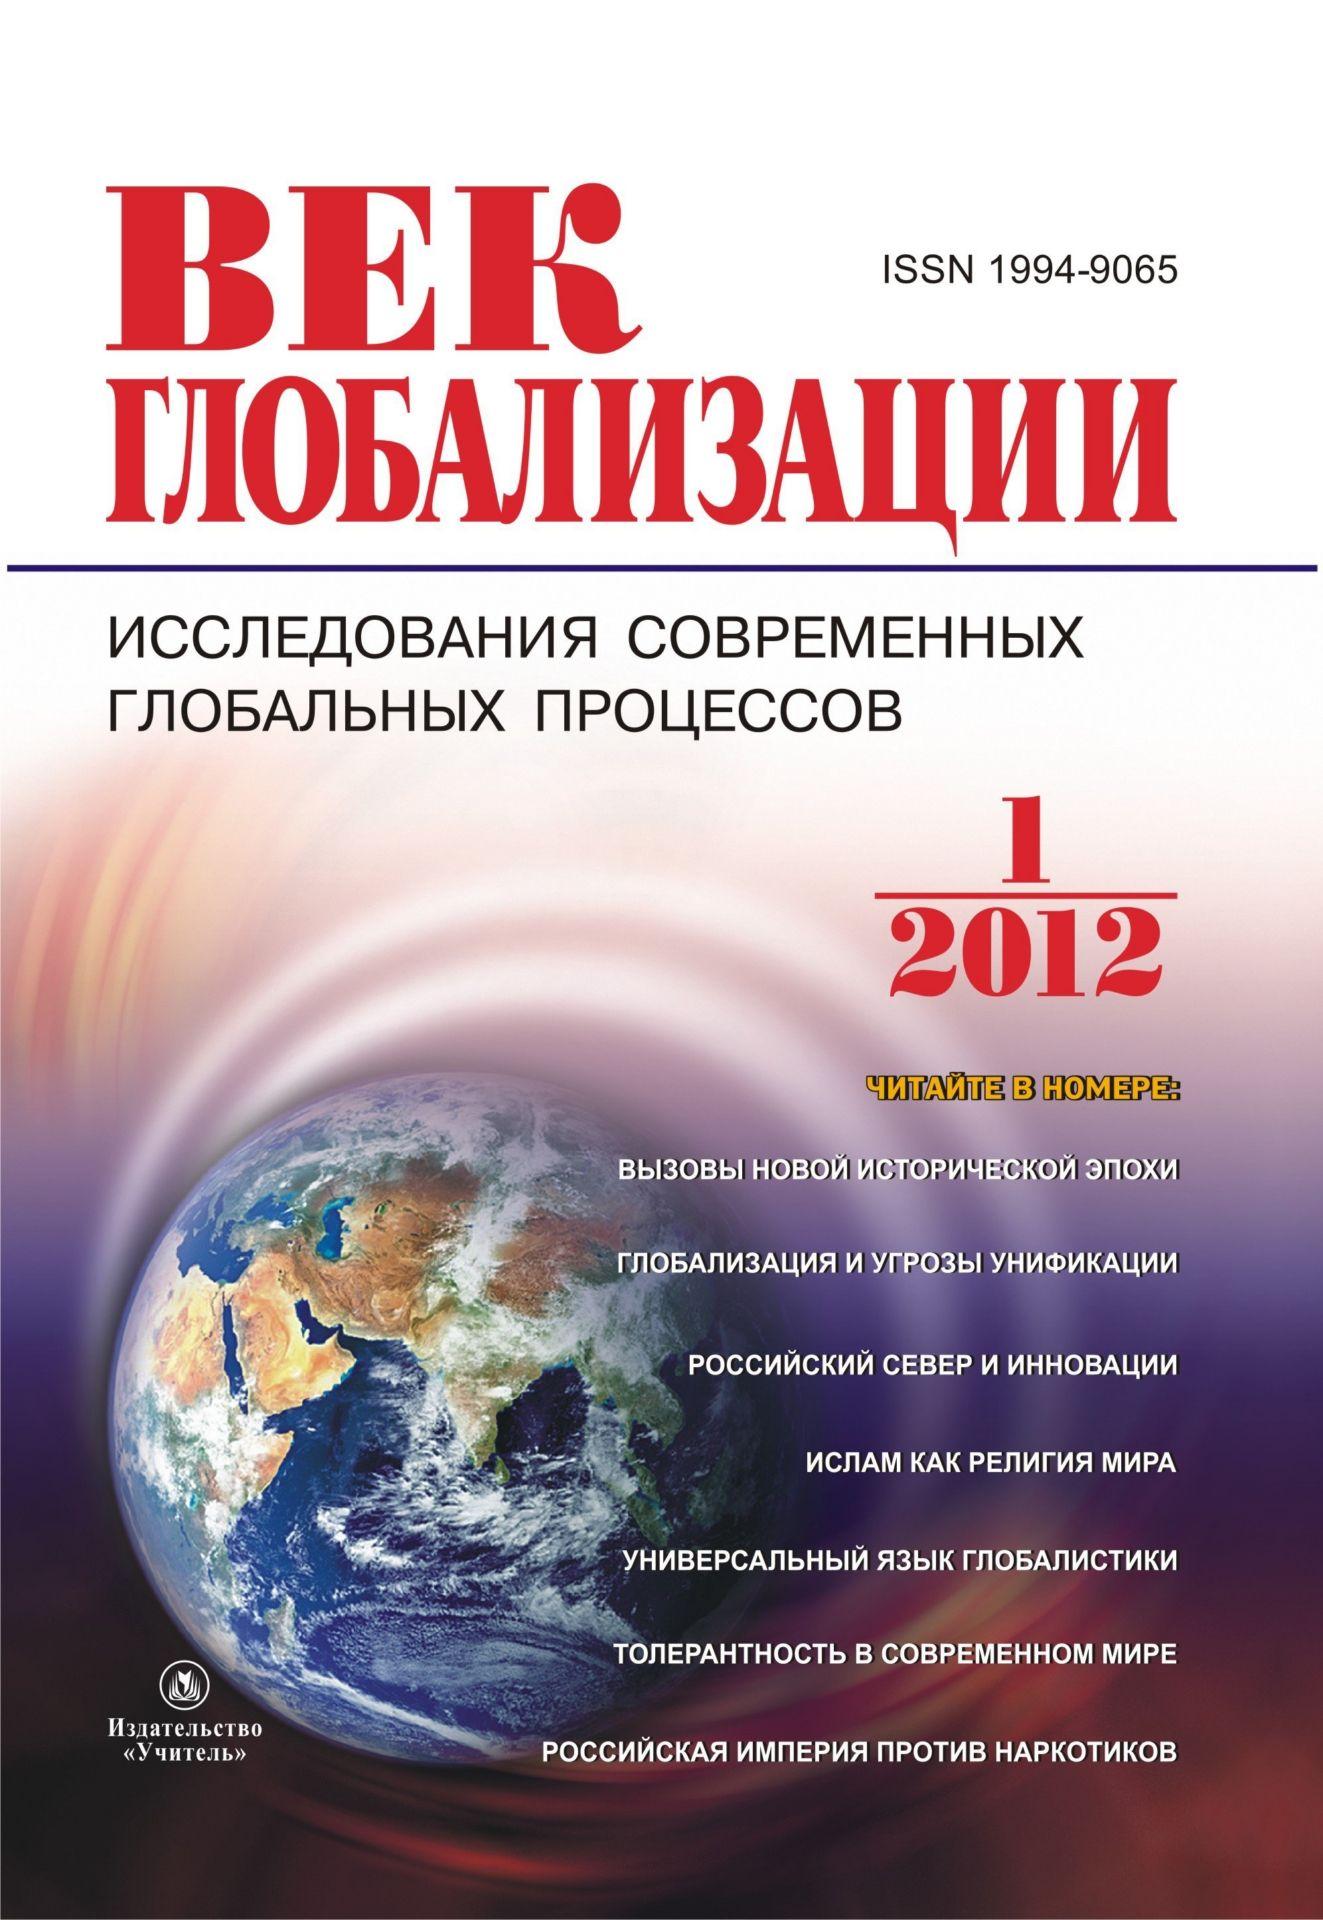 Журнал Век глобализации № 1 2012